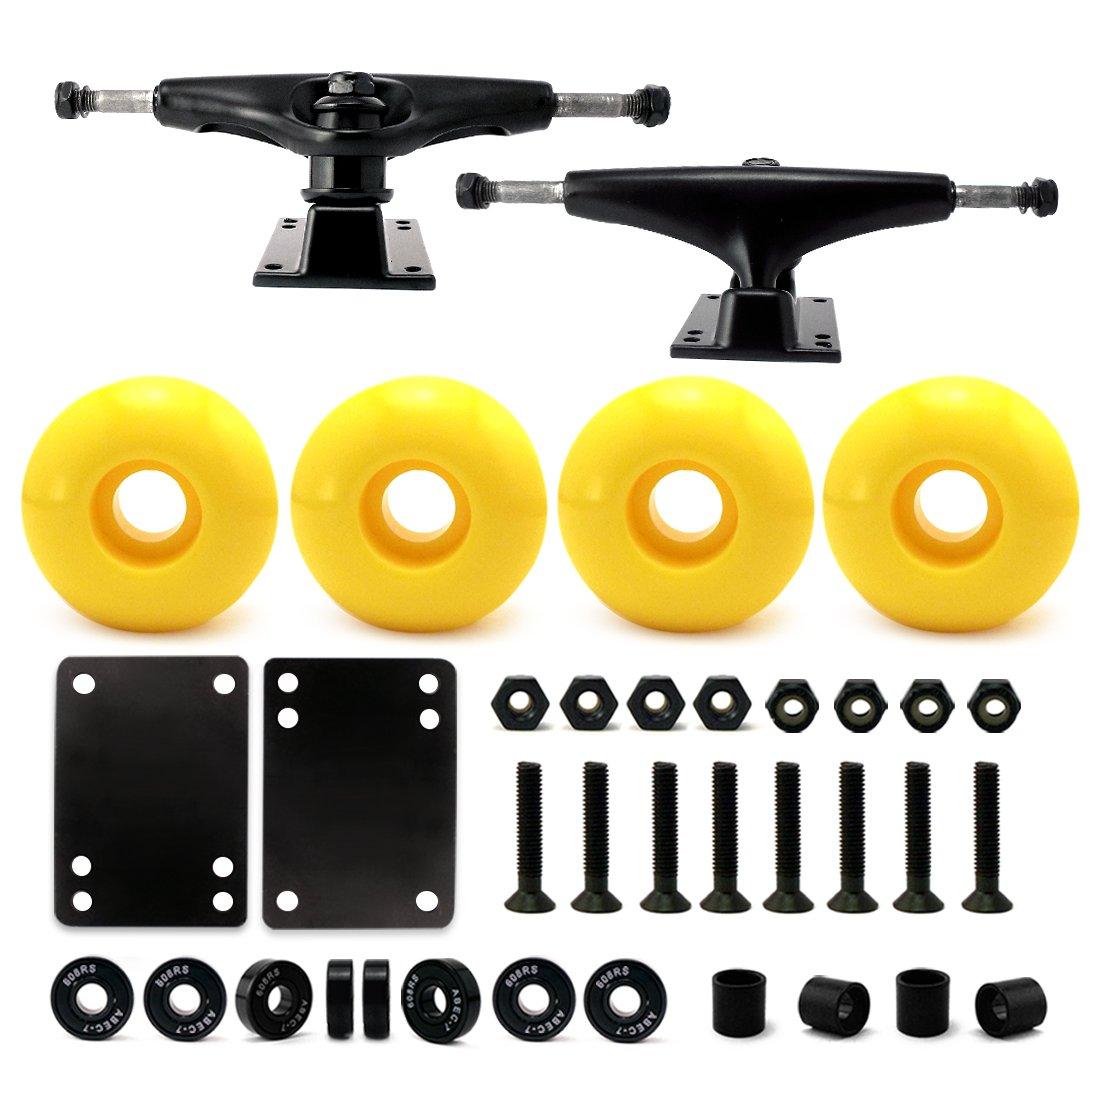 VJ 5.0 Skateboard Trucks (Black), Skateboard Wheels 52mm, Skateboard Bearings, Skateboard Pads, Skateboard Hardware 1'' (52mm Yellow) by VJ